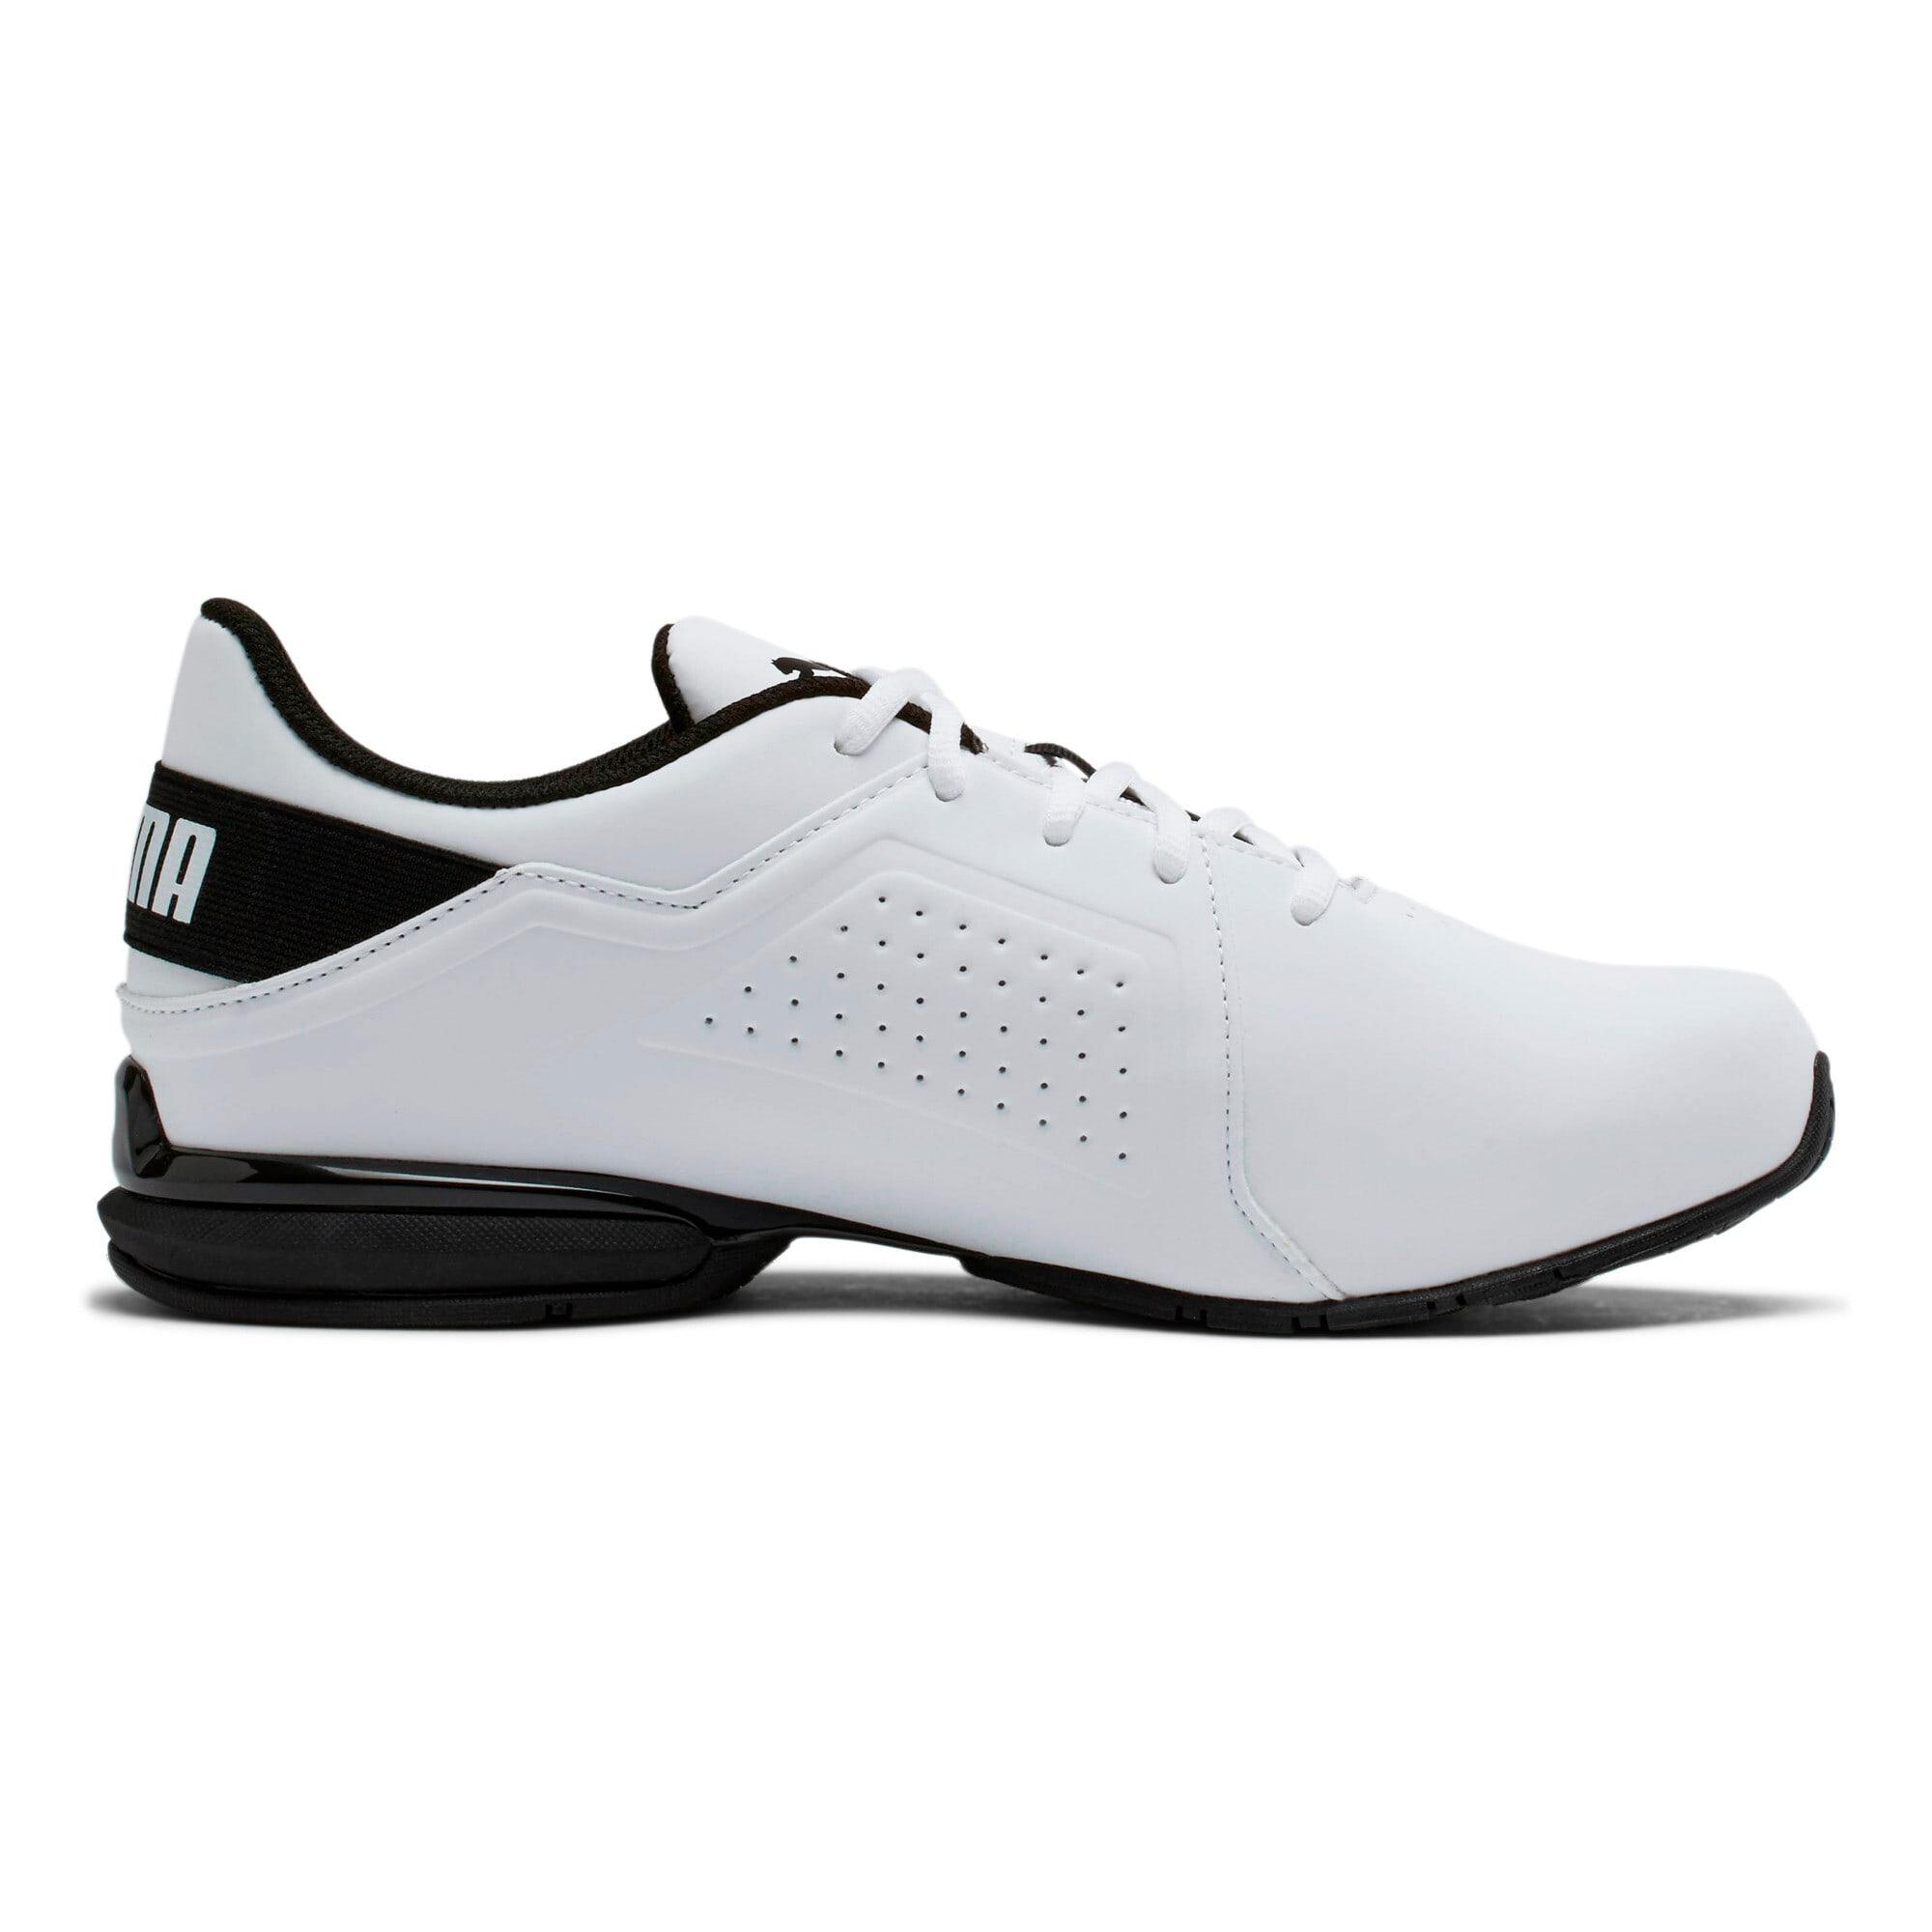 Thumbnail 5 of Viz Runner Men's Running Shoes, Puma White-Puma Black, medium